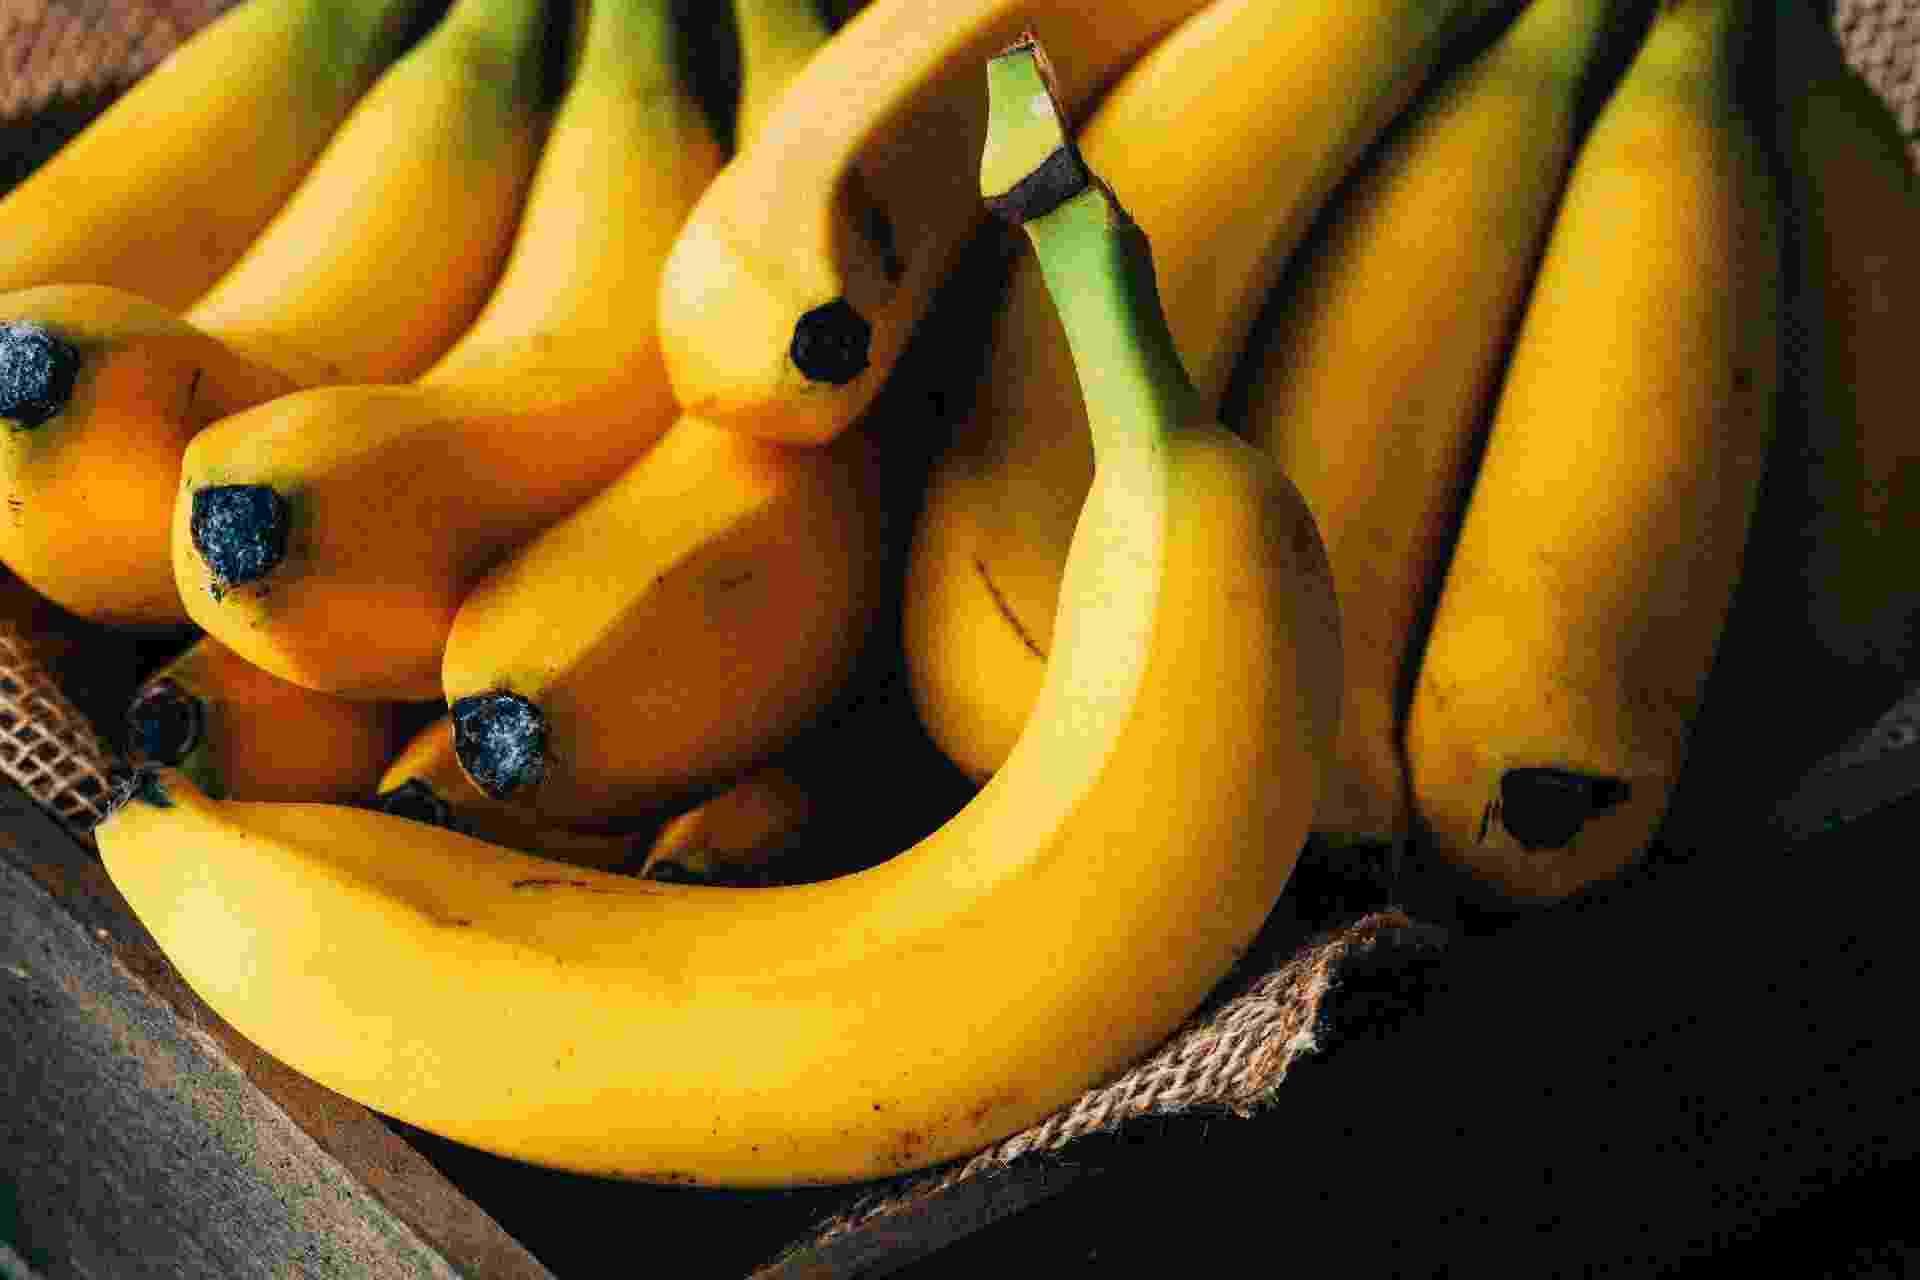 Banana; frutas - Getty Images